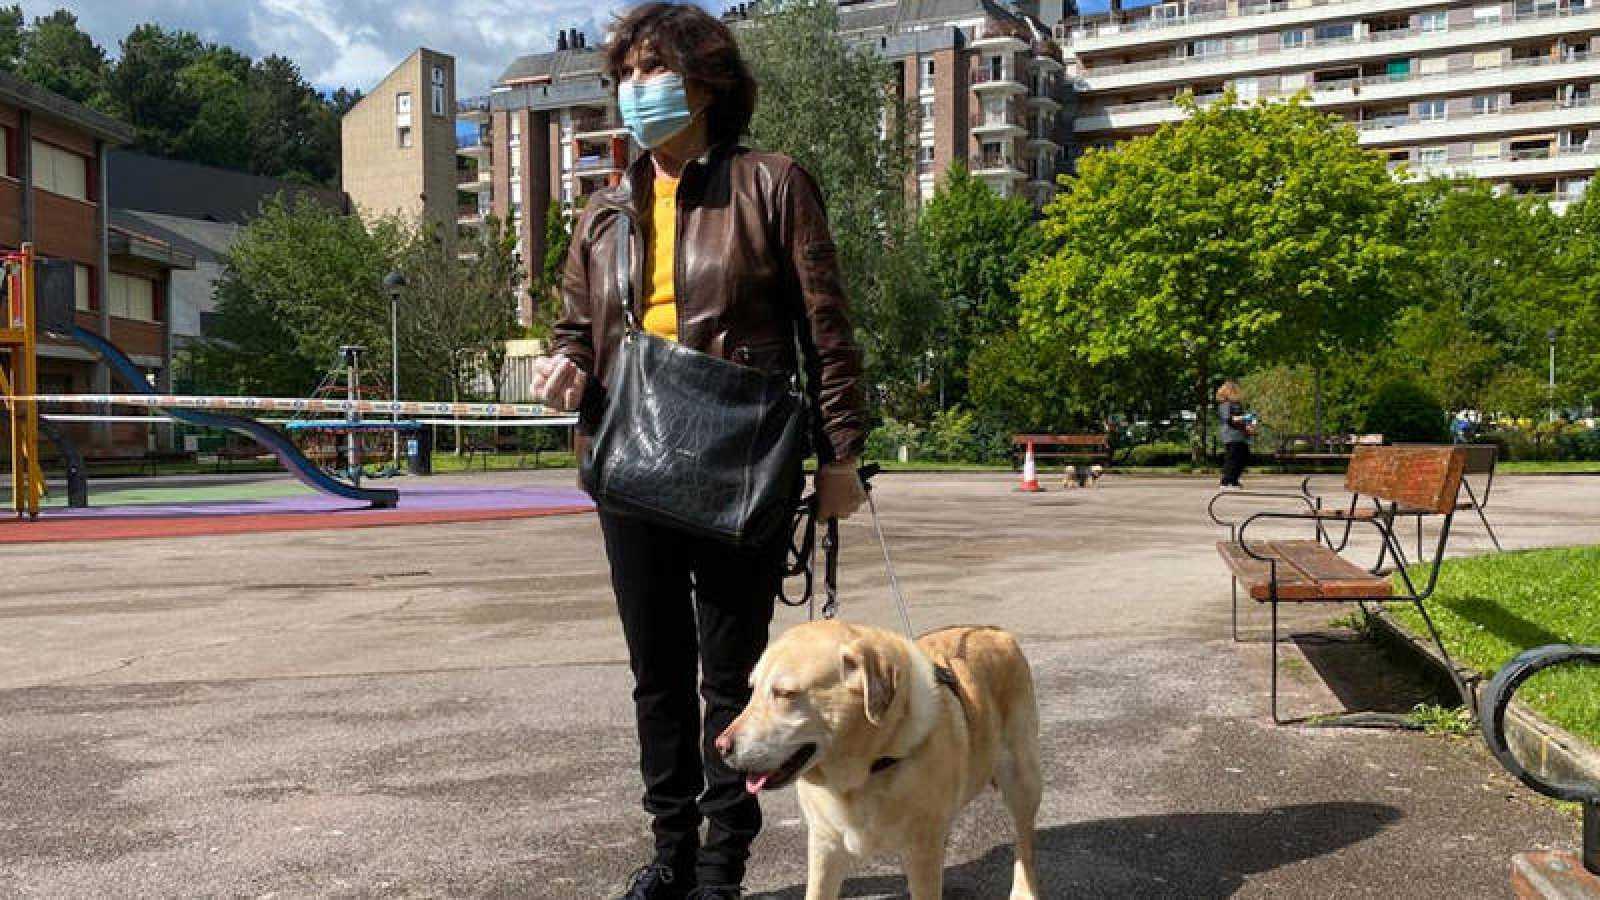 La donostiarra Begoña Manterola paseando con su perra Jewua